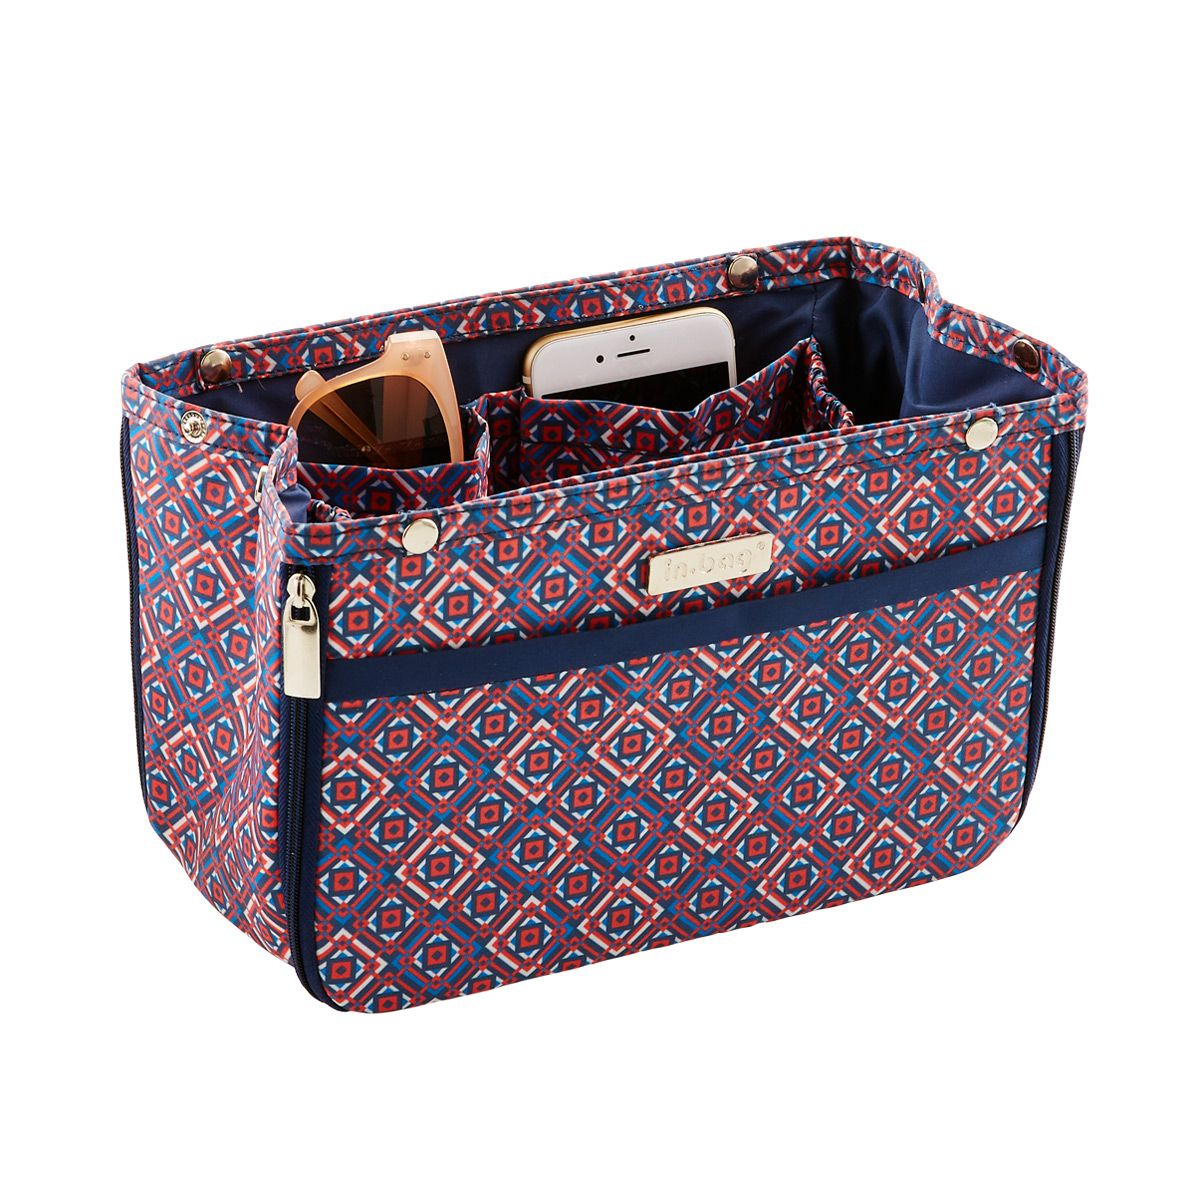 e41850343 6 Best Handbag Organizers - Best Purse Organizers and Inserts